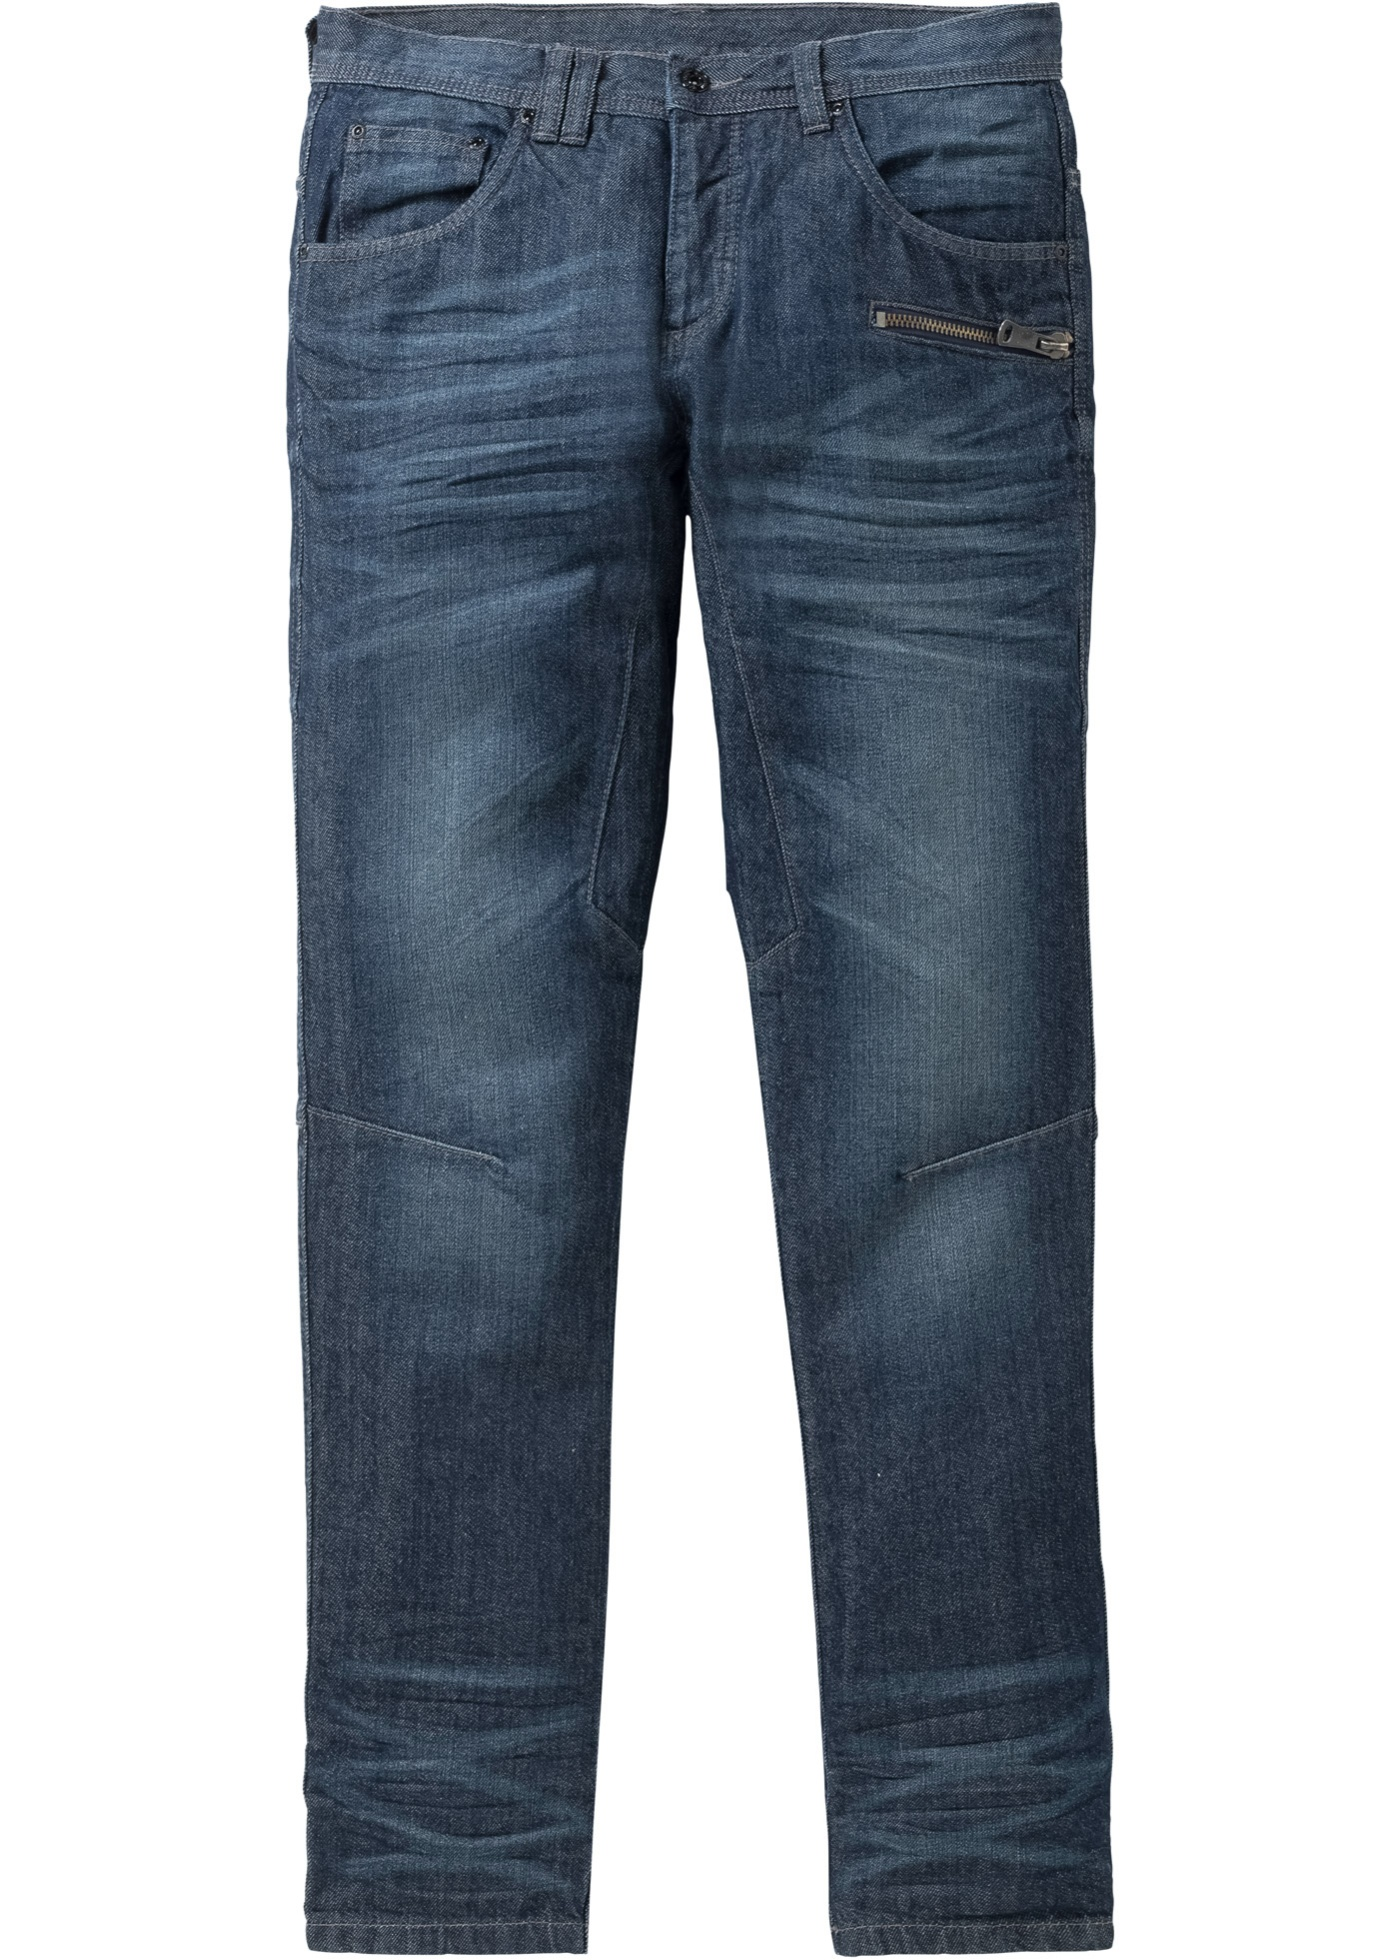 Bonprix SE - Jeans, normal passform, avsmalnande ben 269.00